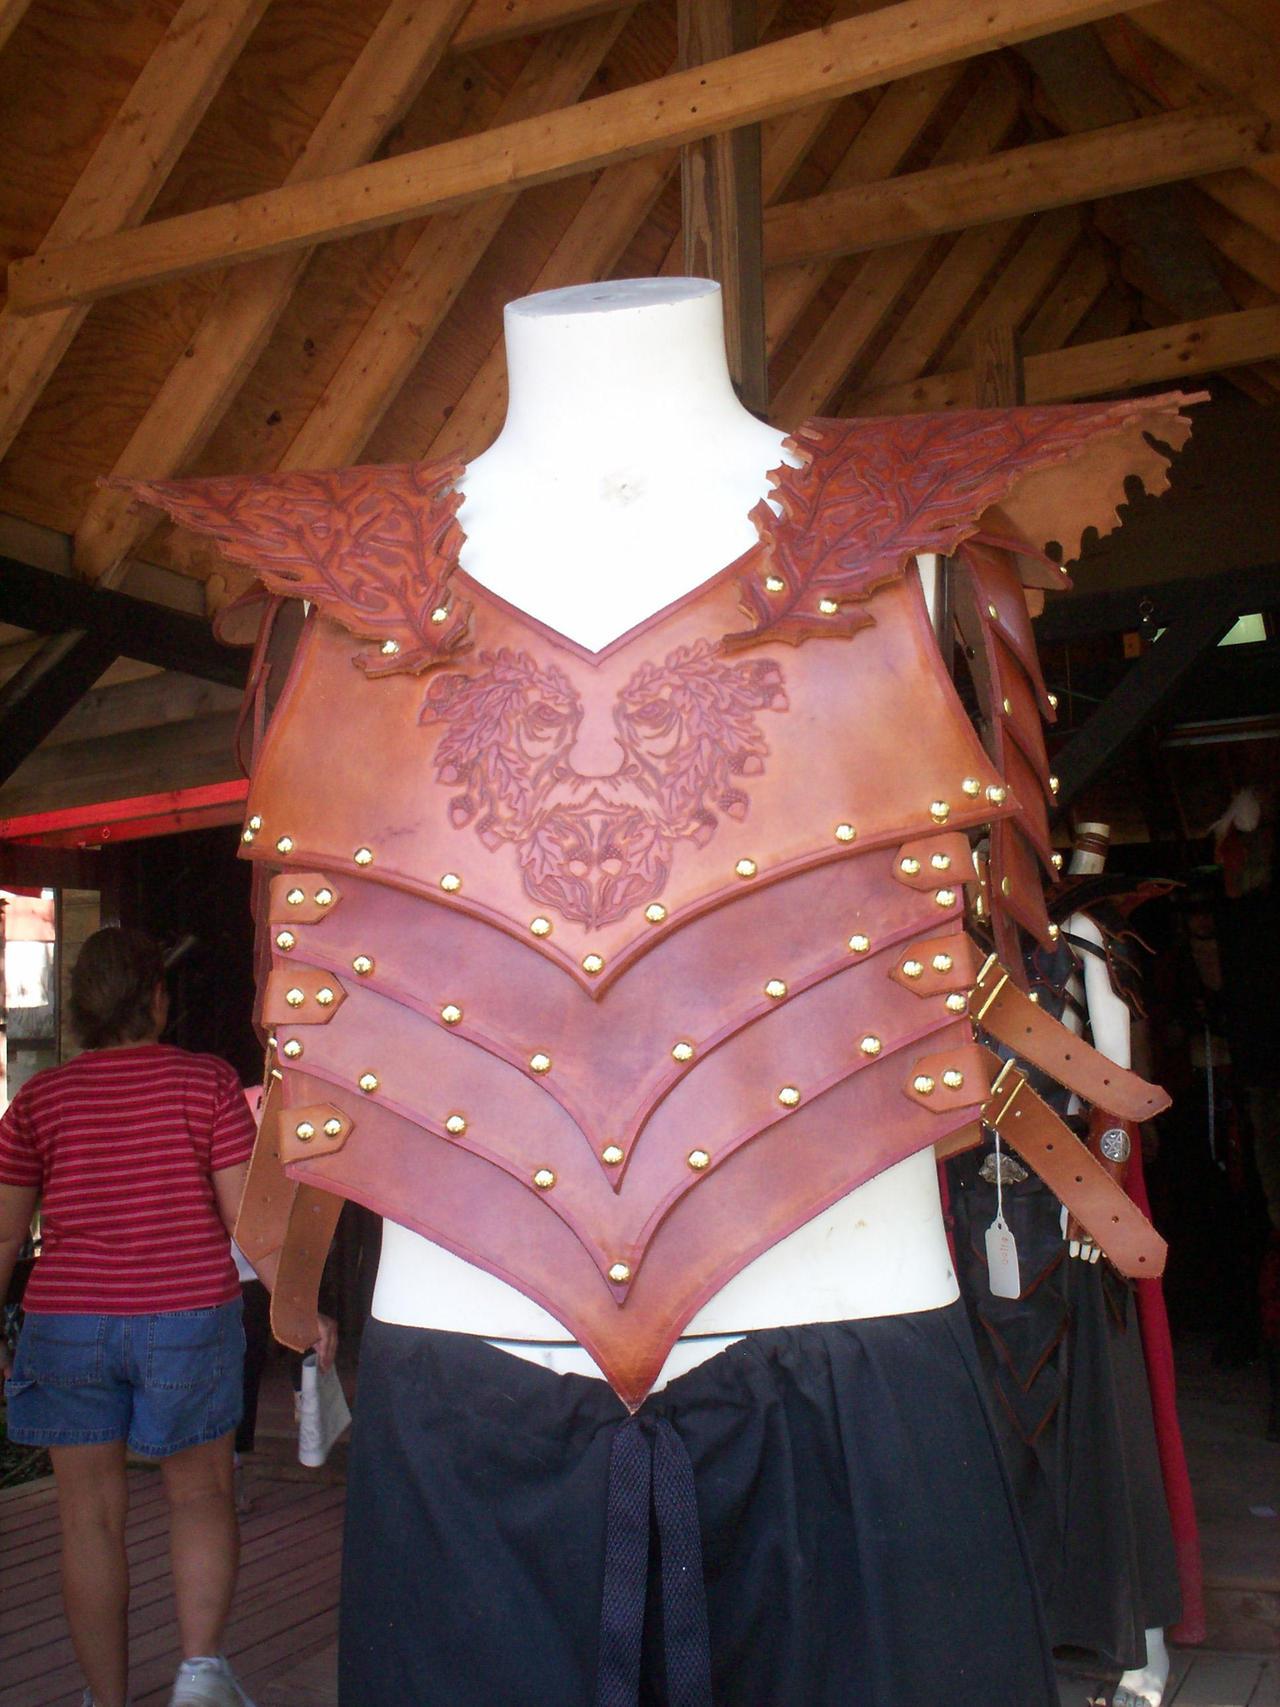 Renaissance Costume - Armor 2 by sd-stock